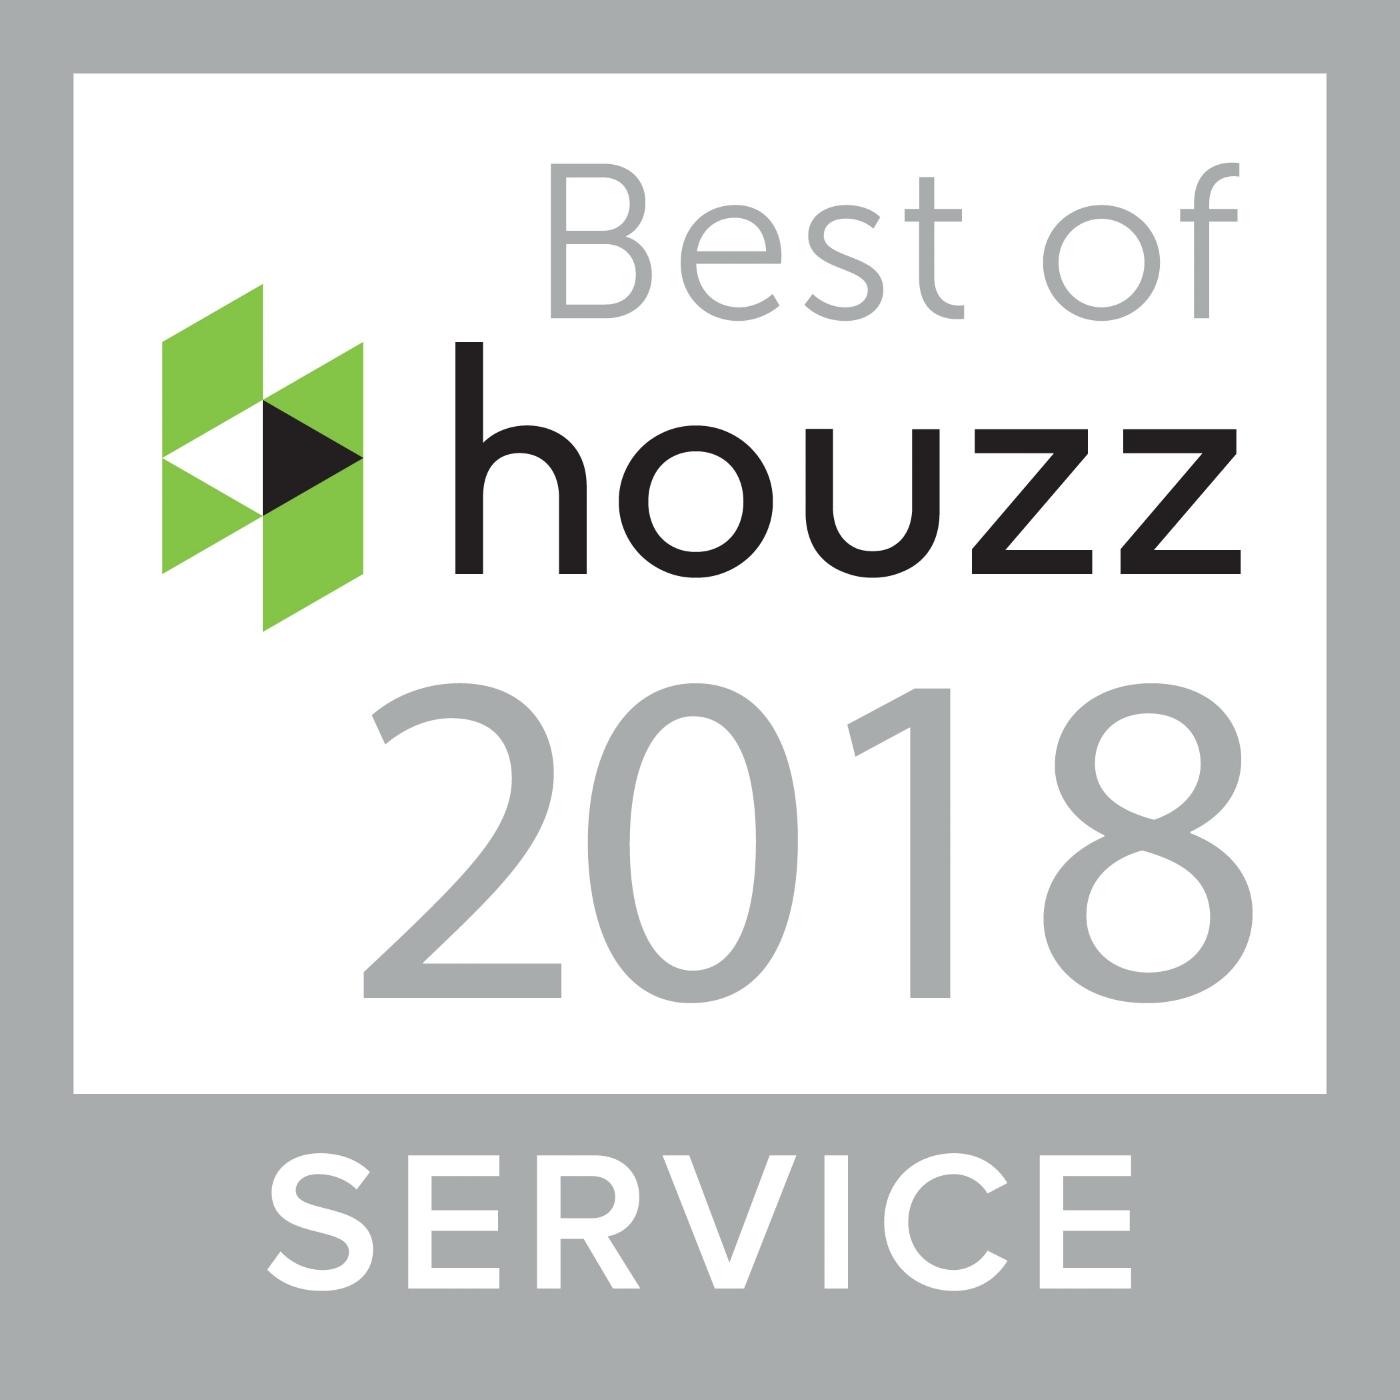 Best of houzz 2018 edited.jpg